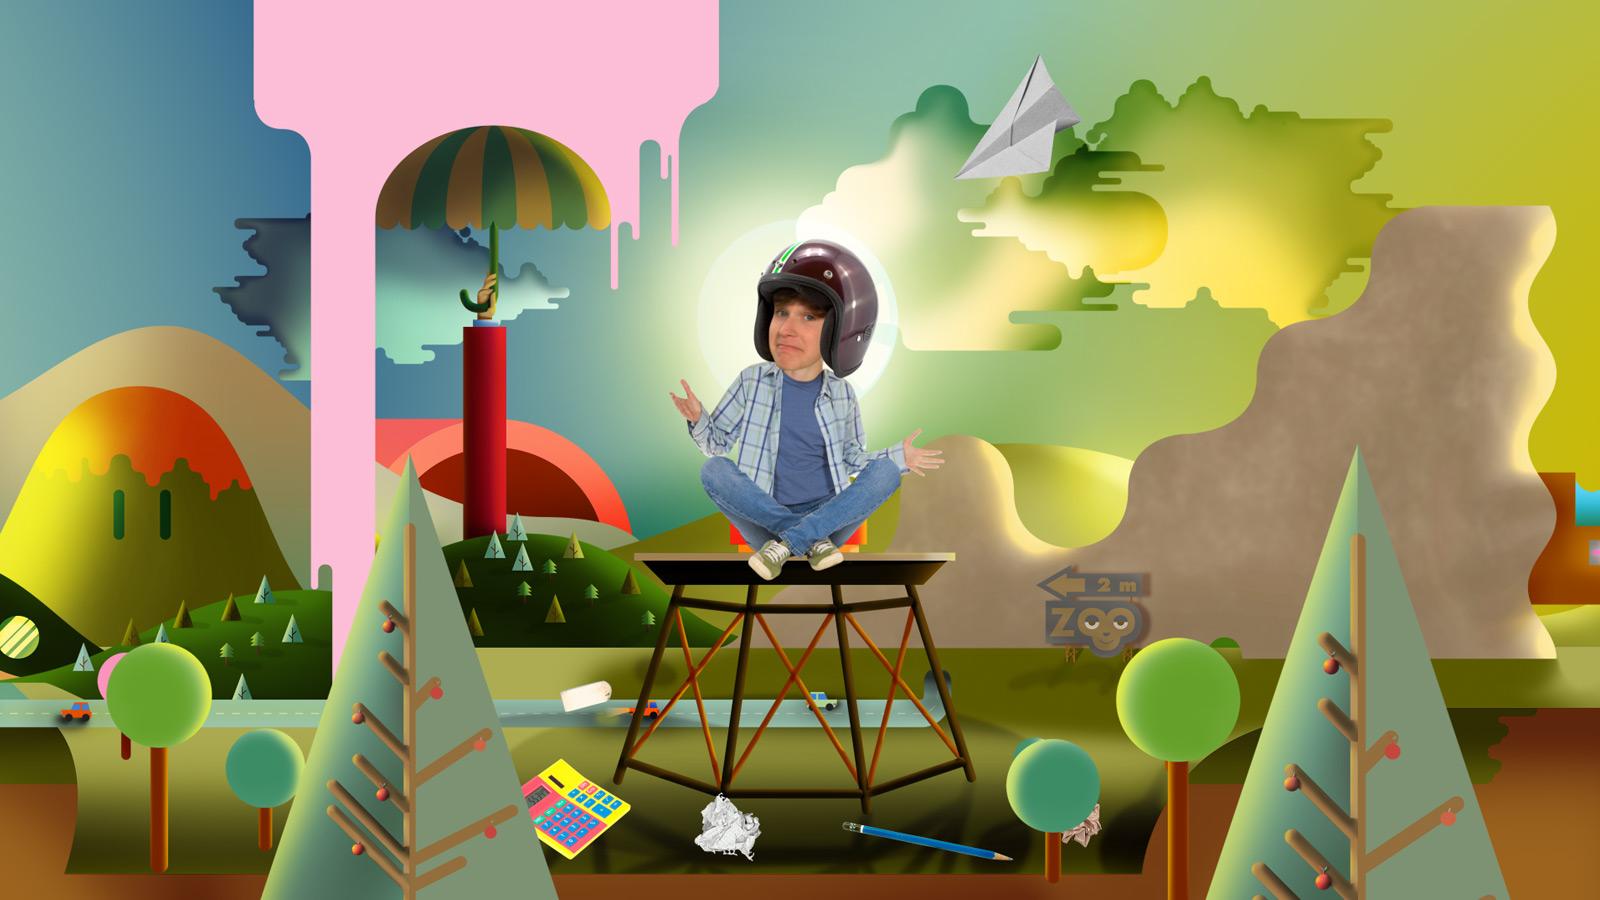 Image - Nickelodeon UK rebrand colourforms